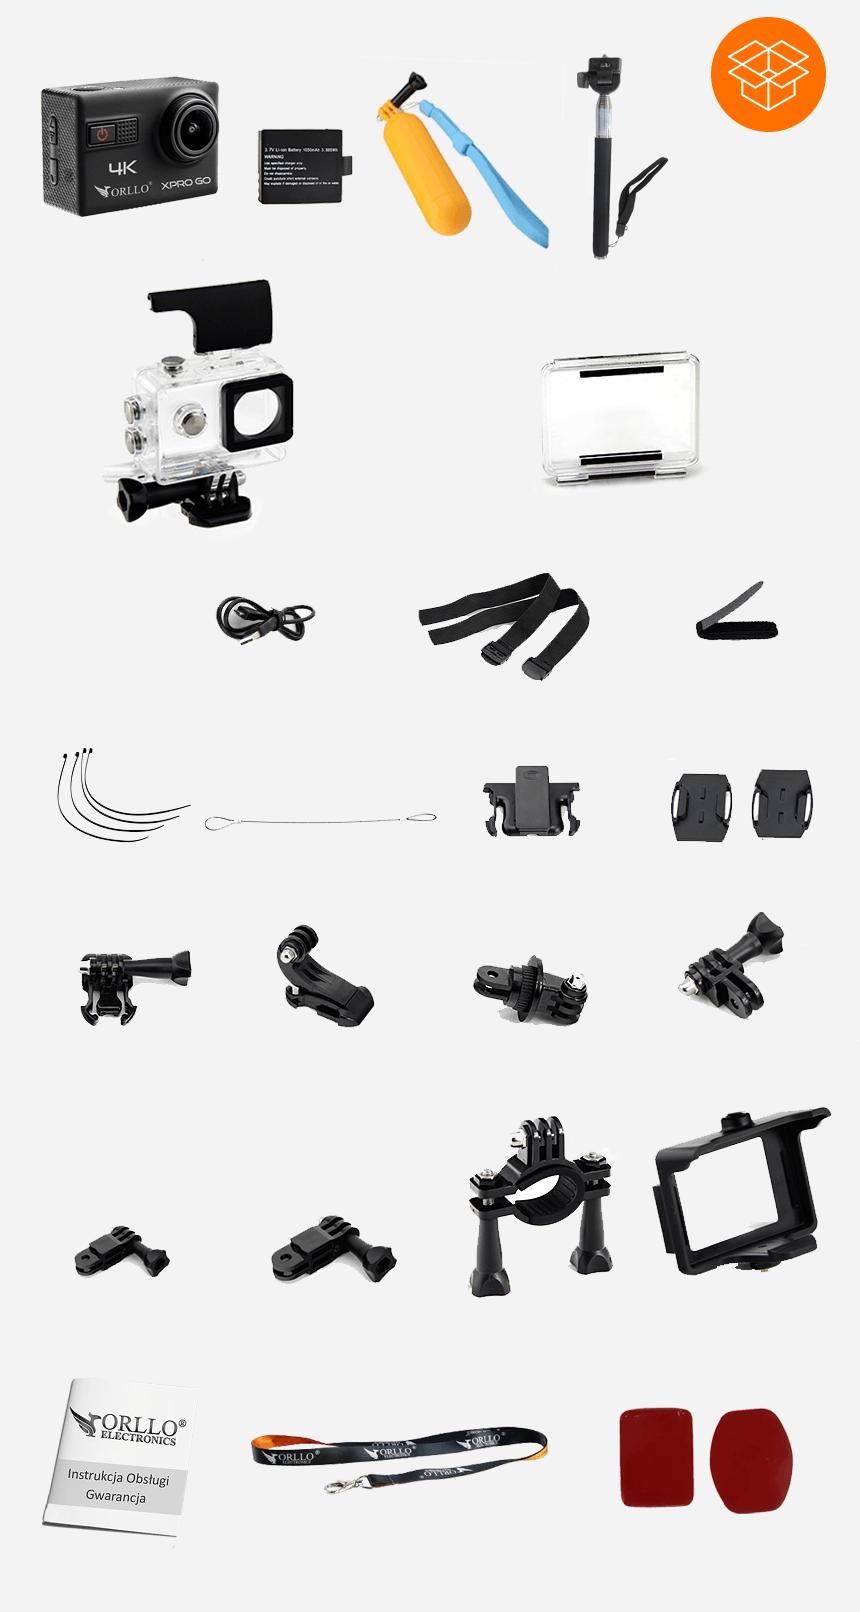 Nowa-kamera-sportowa-XPRO-orllo.pl